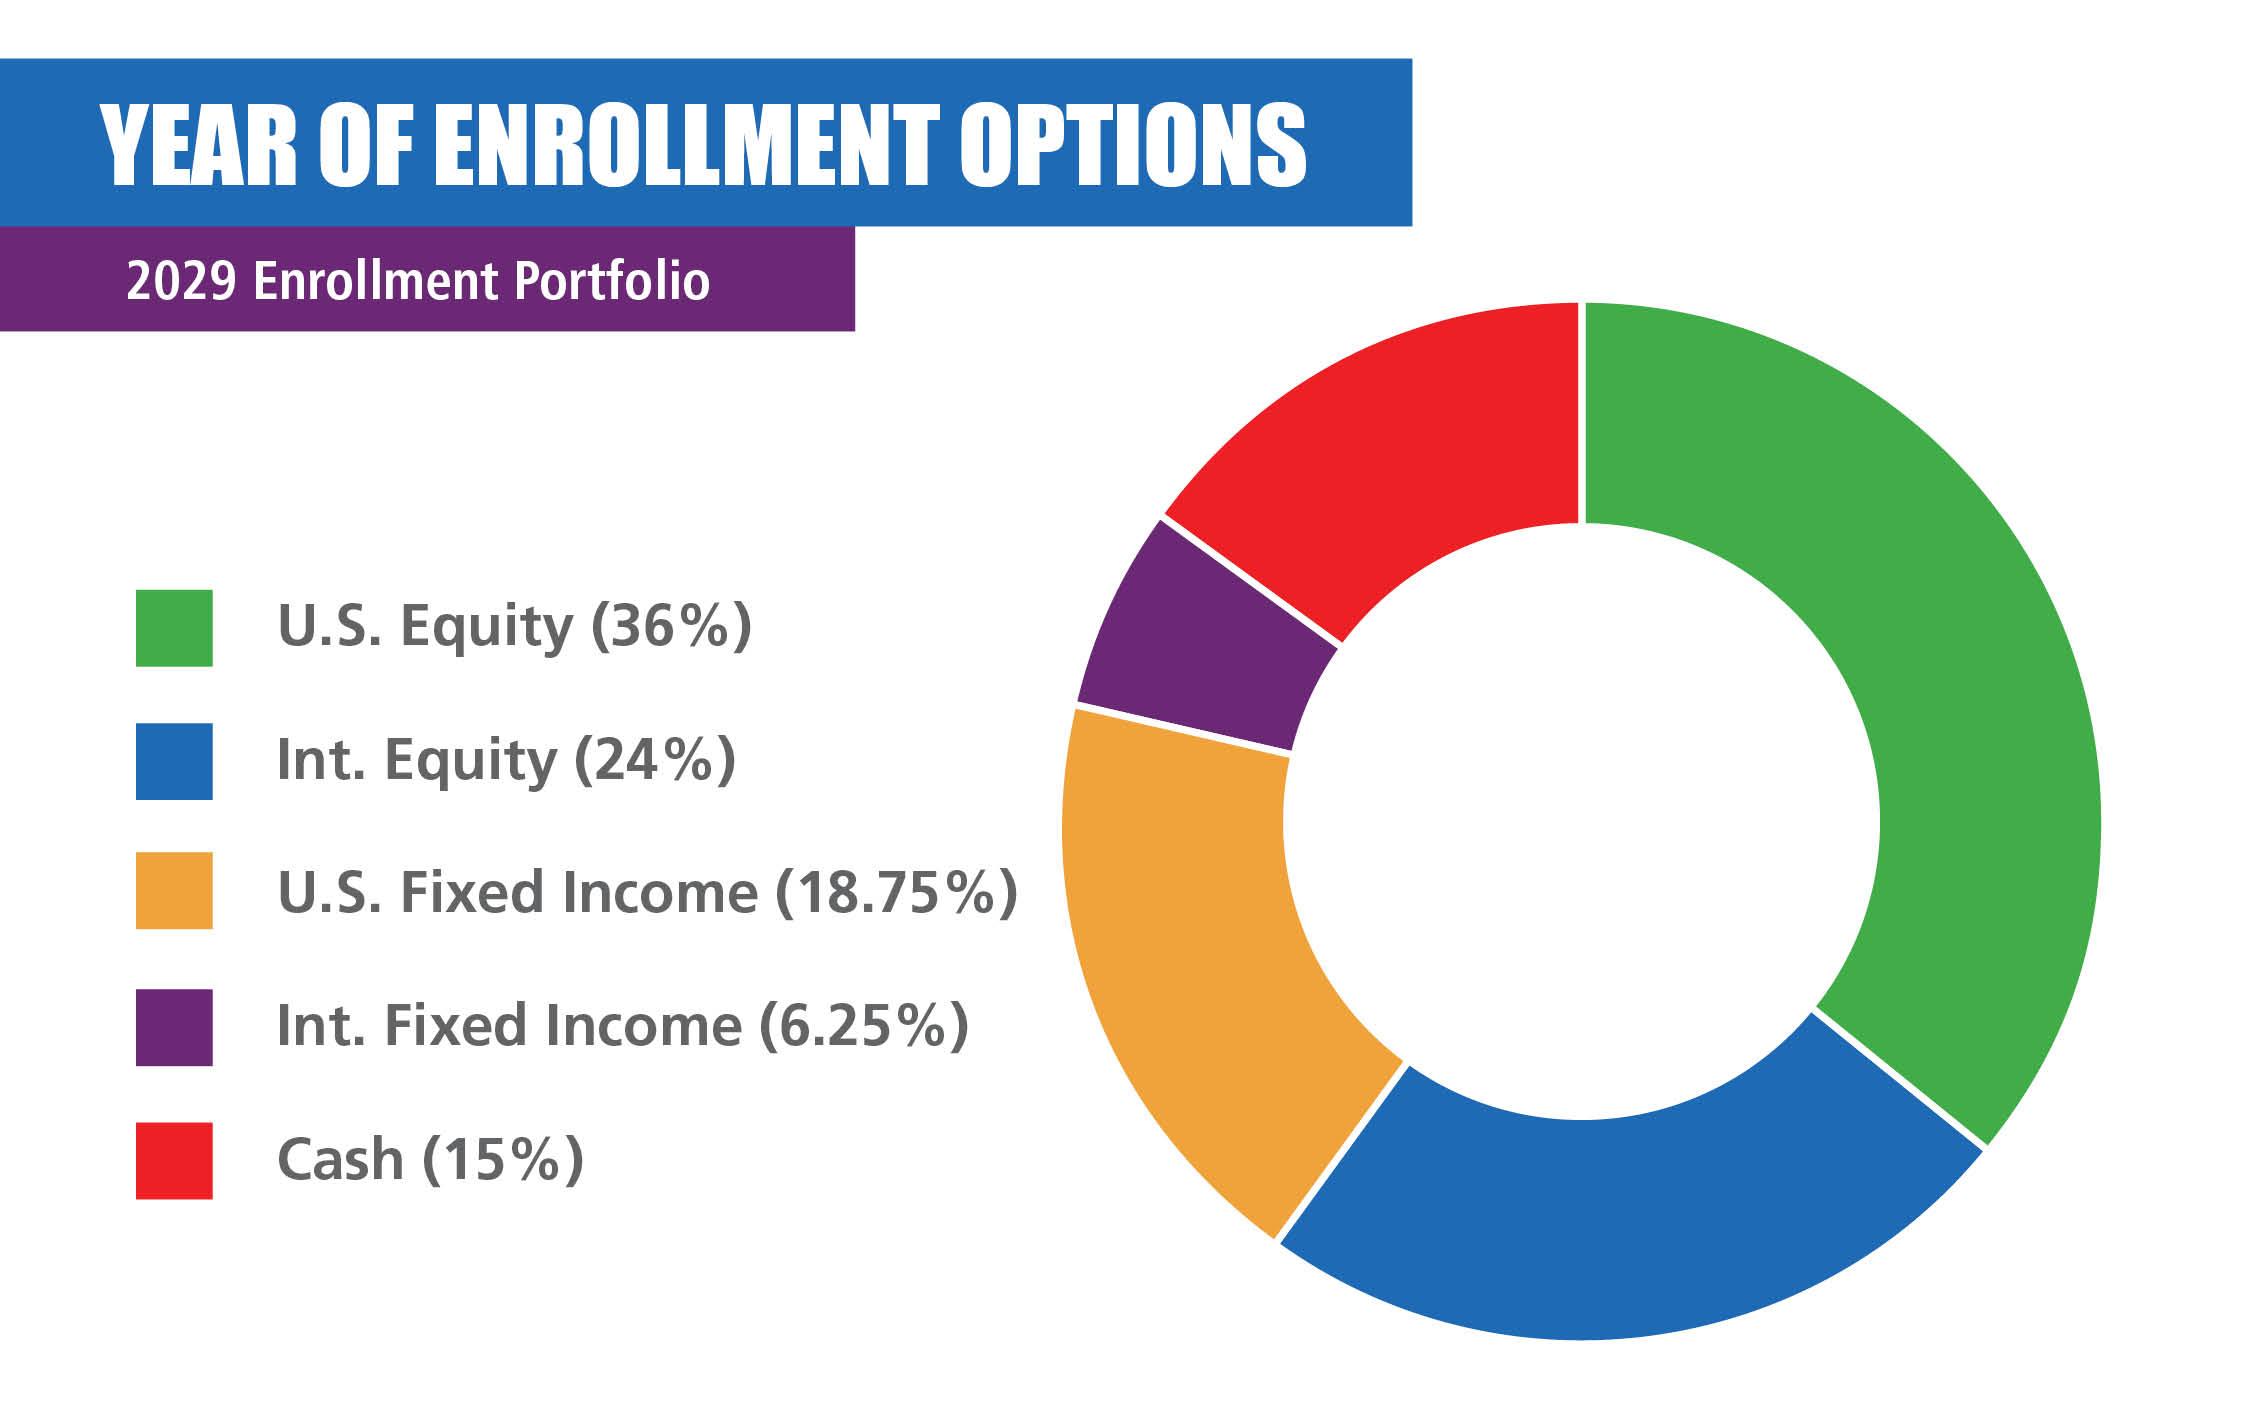 2029 Enrollment Portfolio